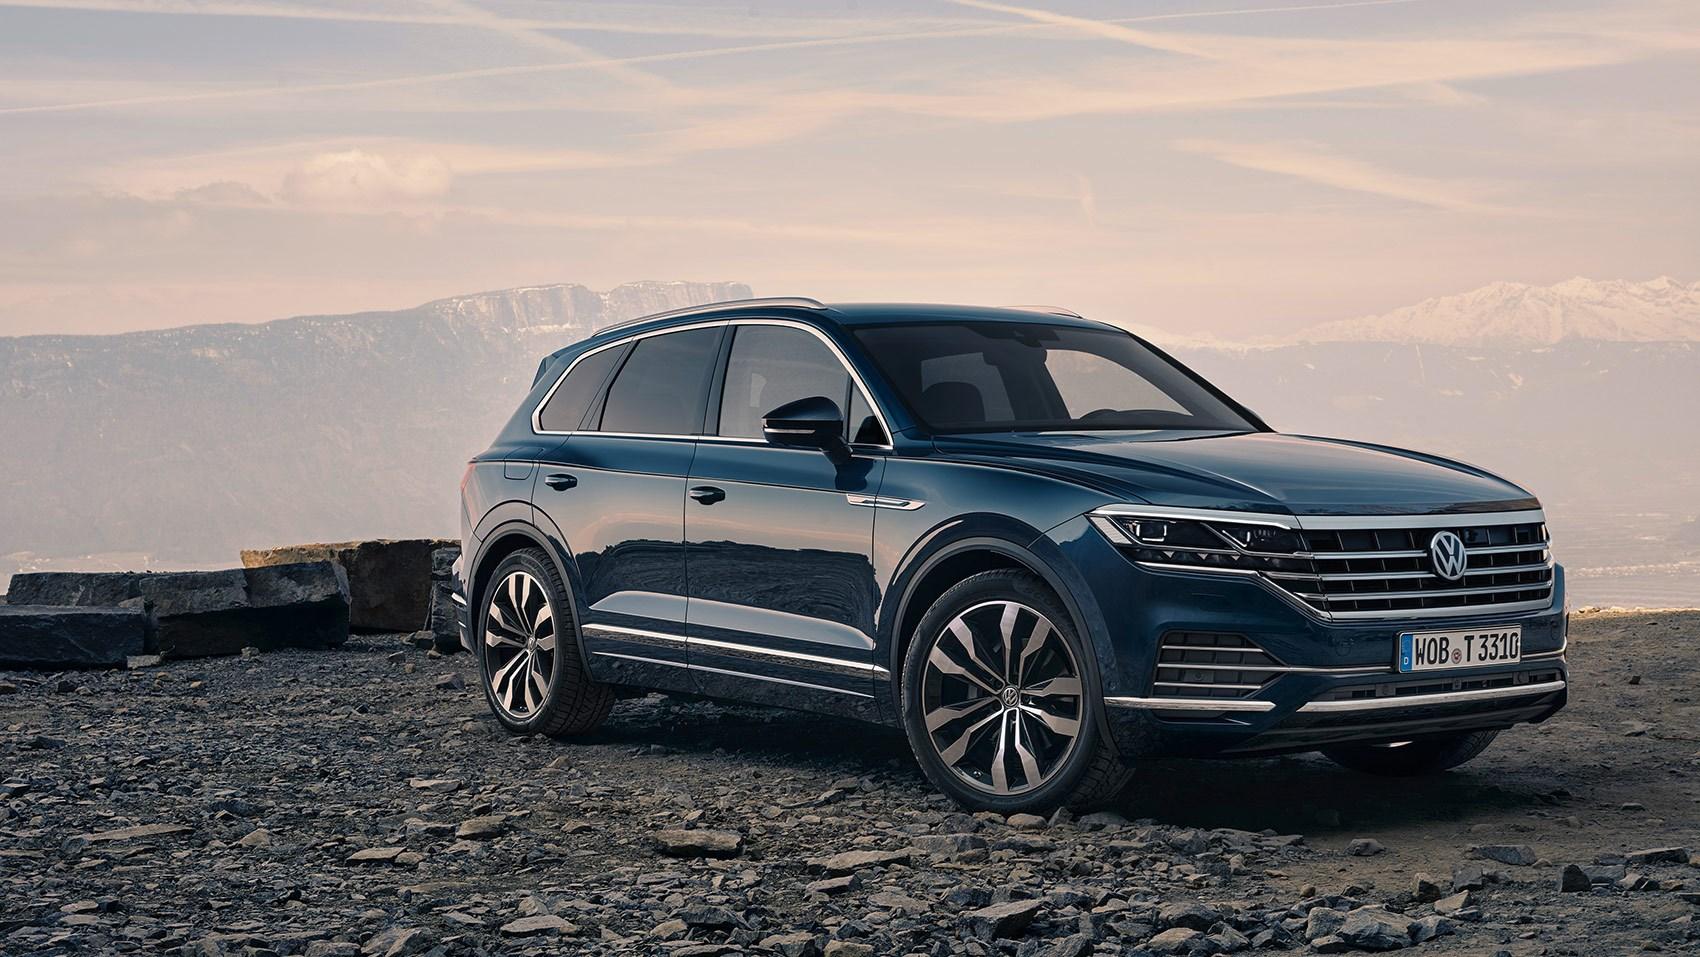 VW Touareg review (2018): specs prices on sale date   CAR Magazine